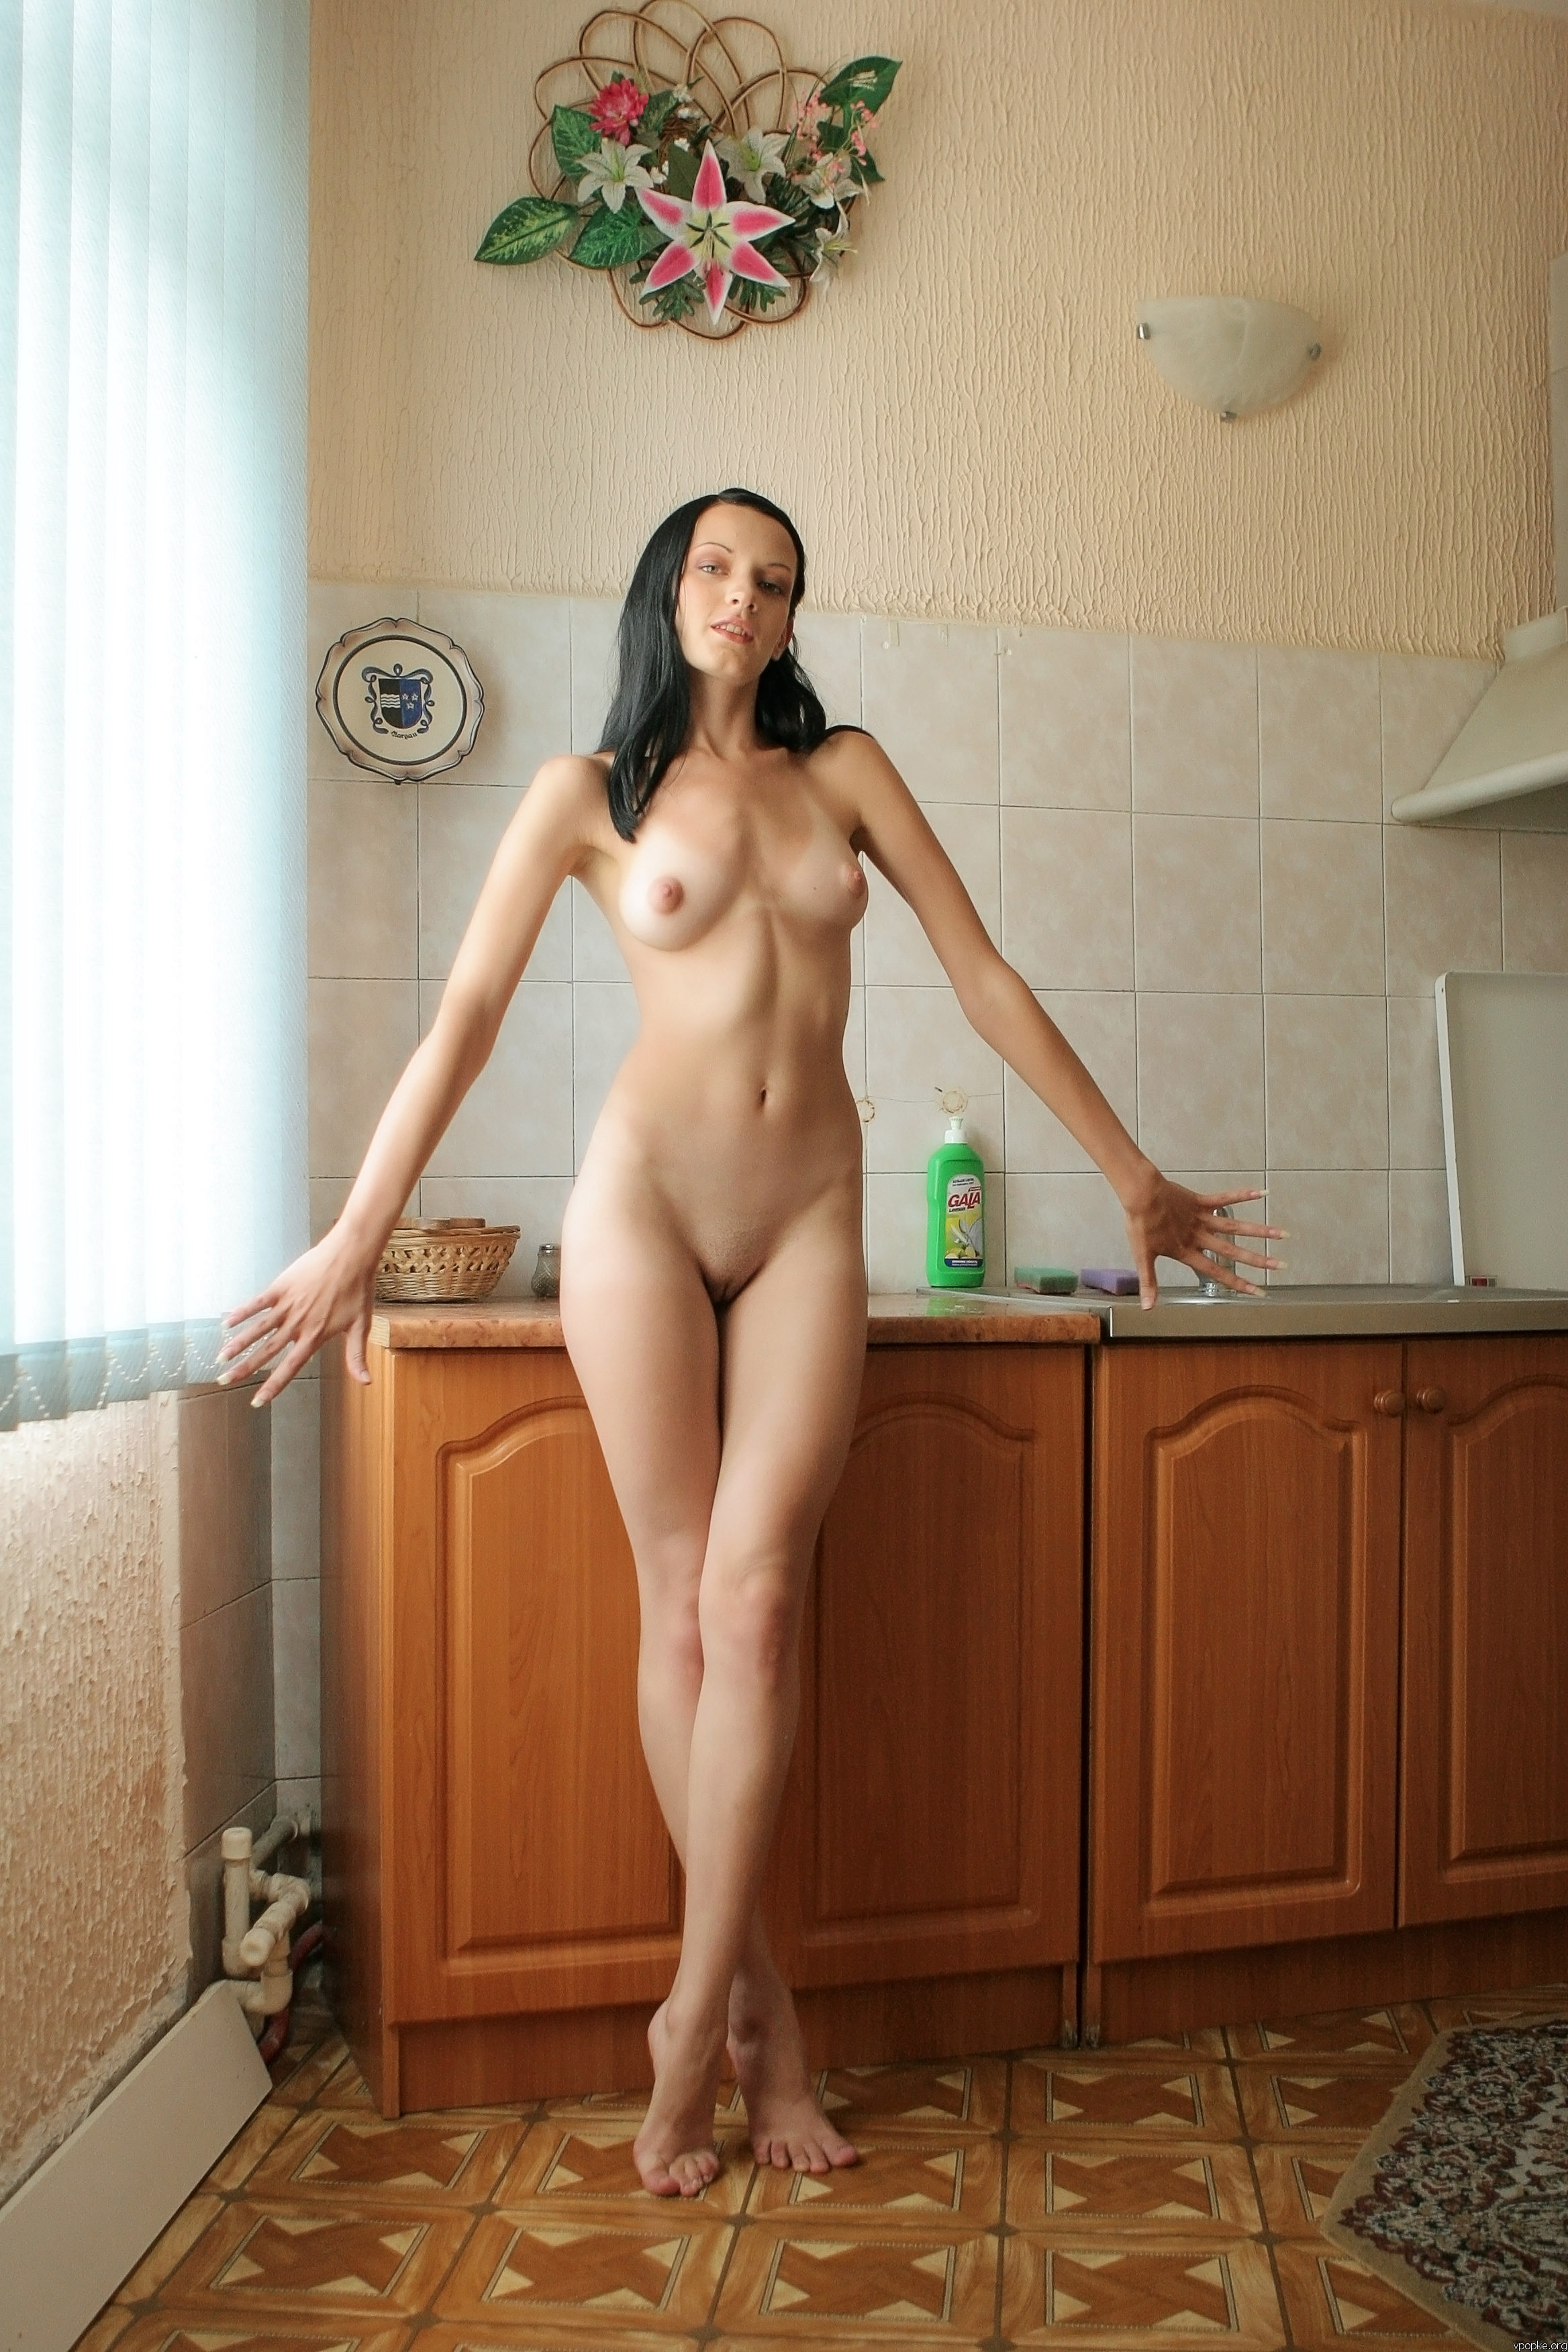 https://boobsmo.com/content/195/boobsmo_com_0000__81.jpg